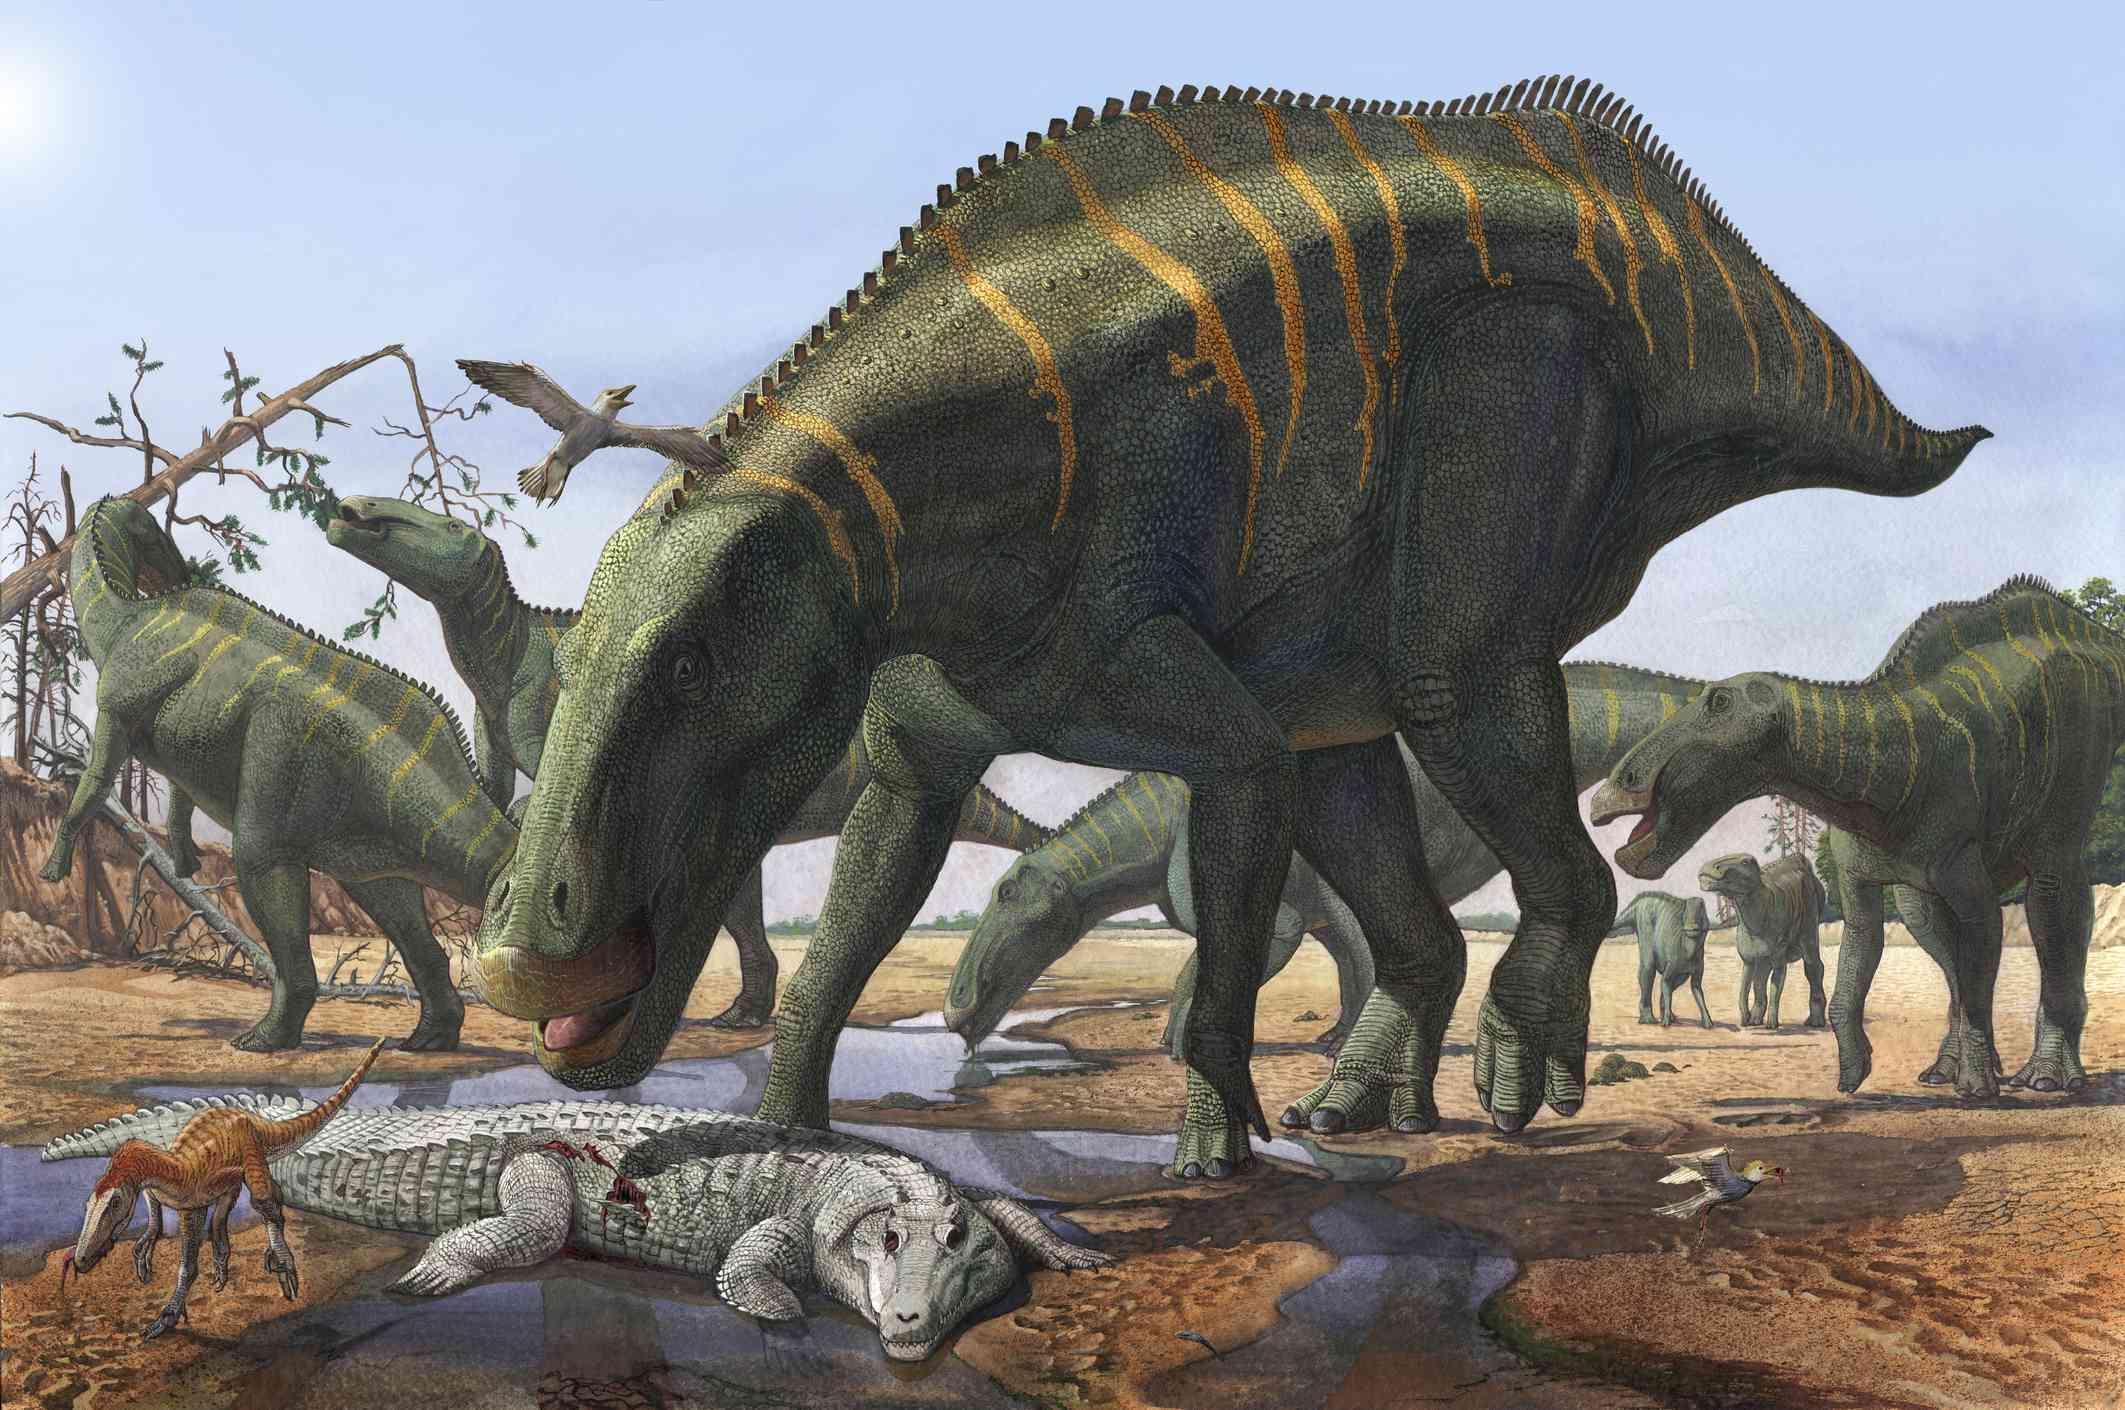 A herd of Shantungosaurus dinosaurs scavenging for food.